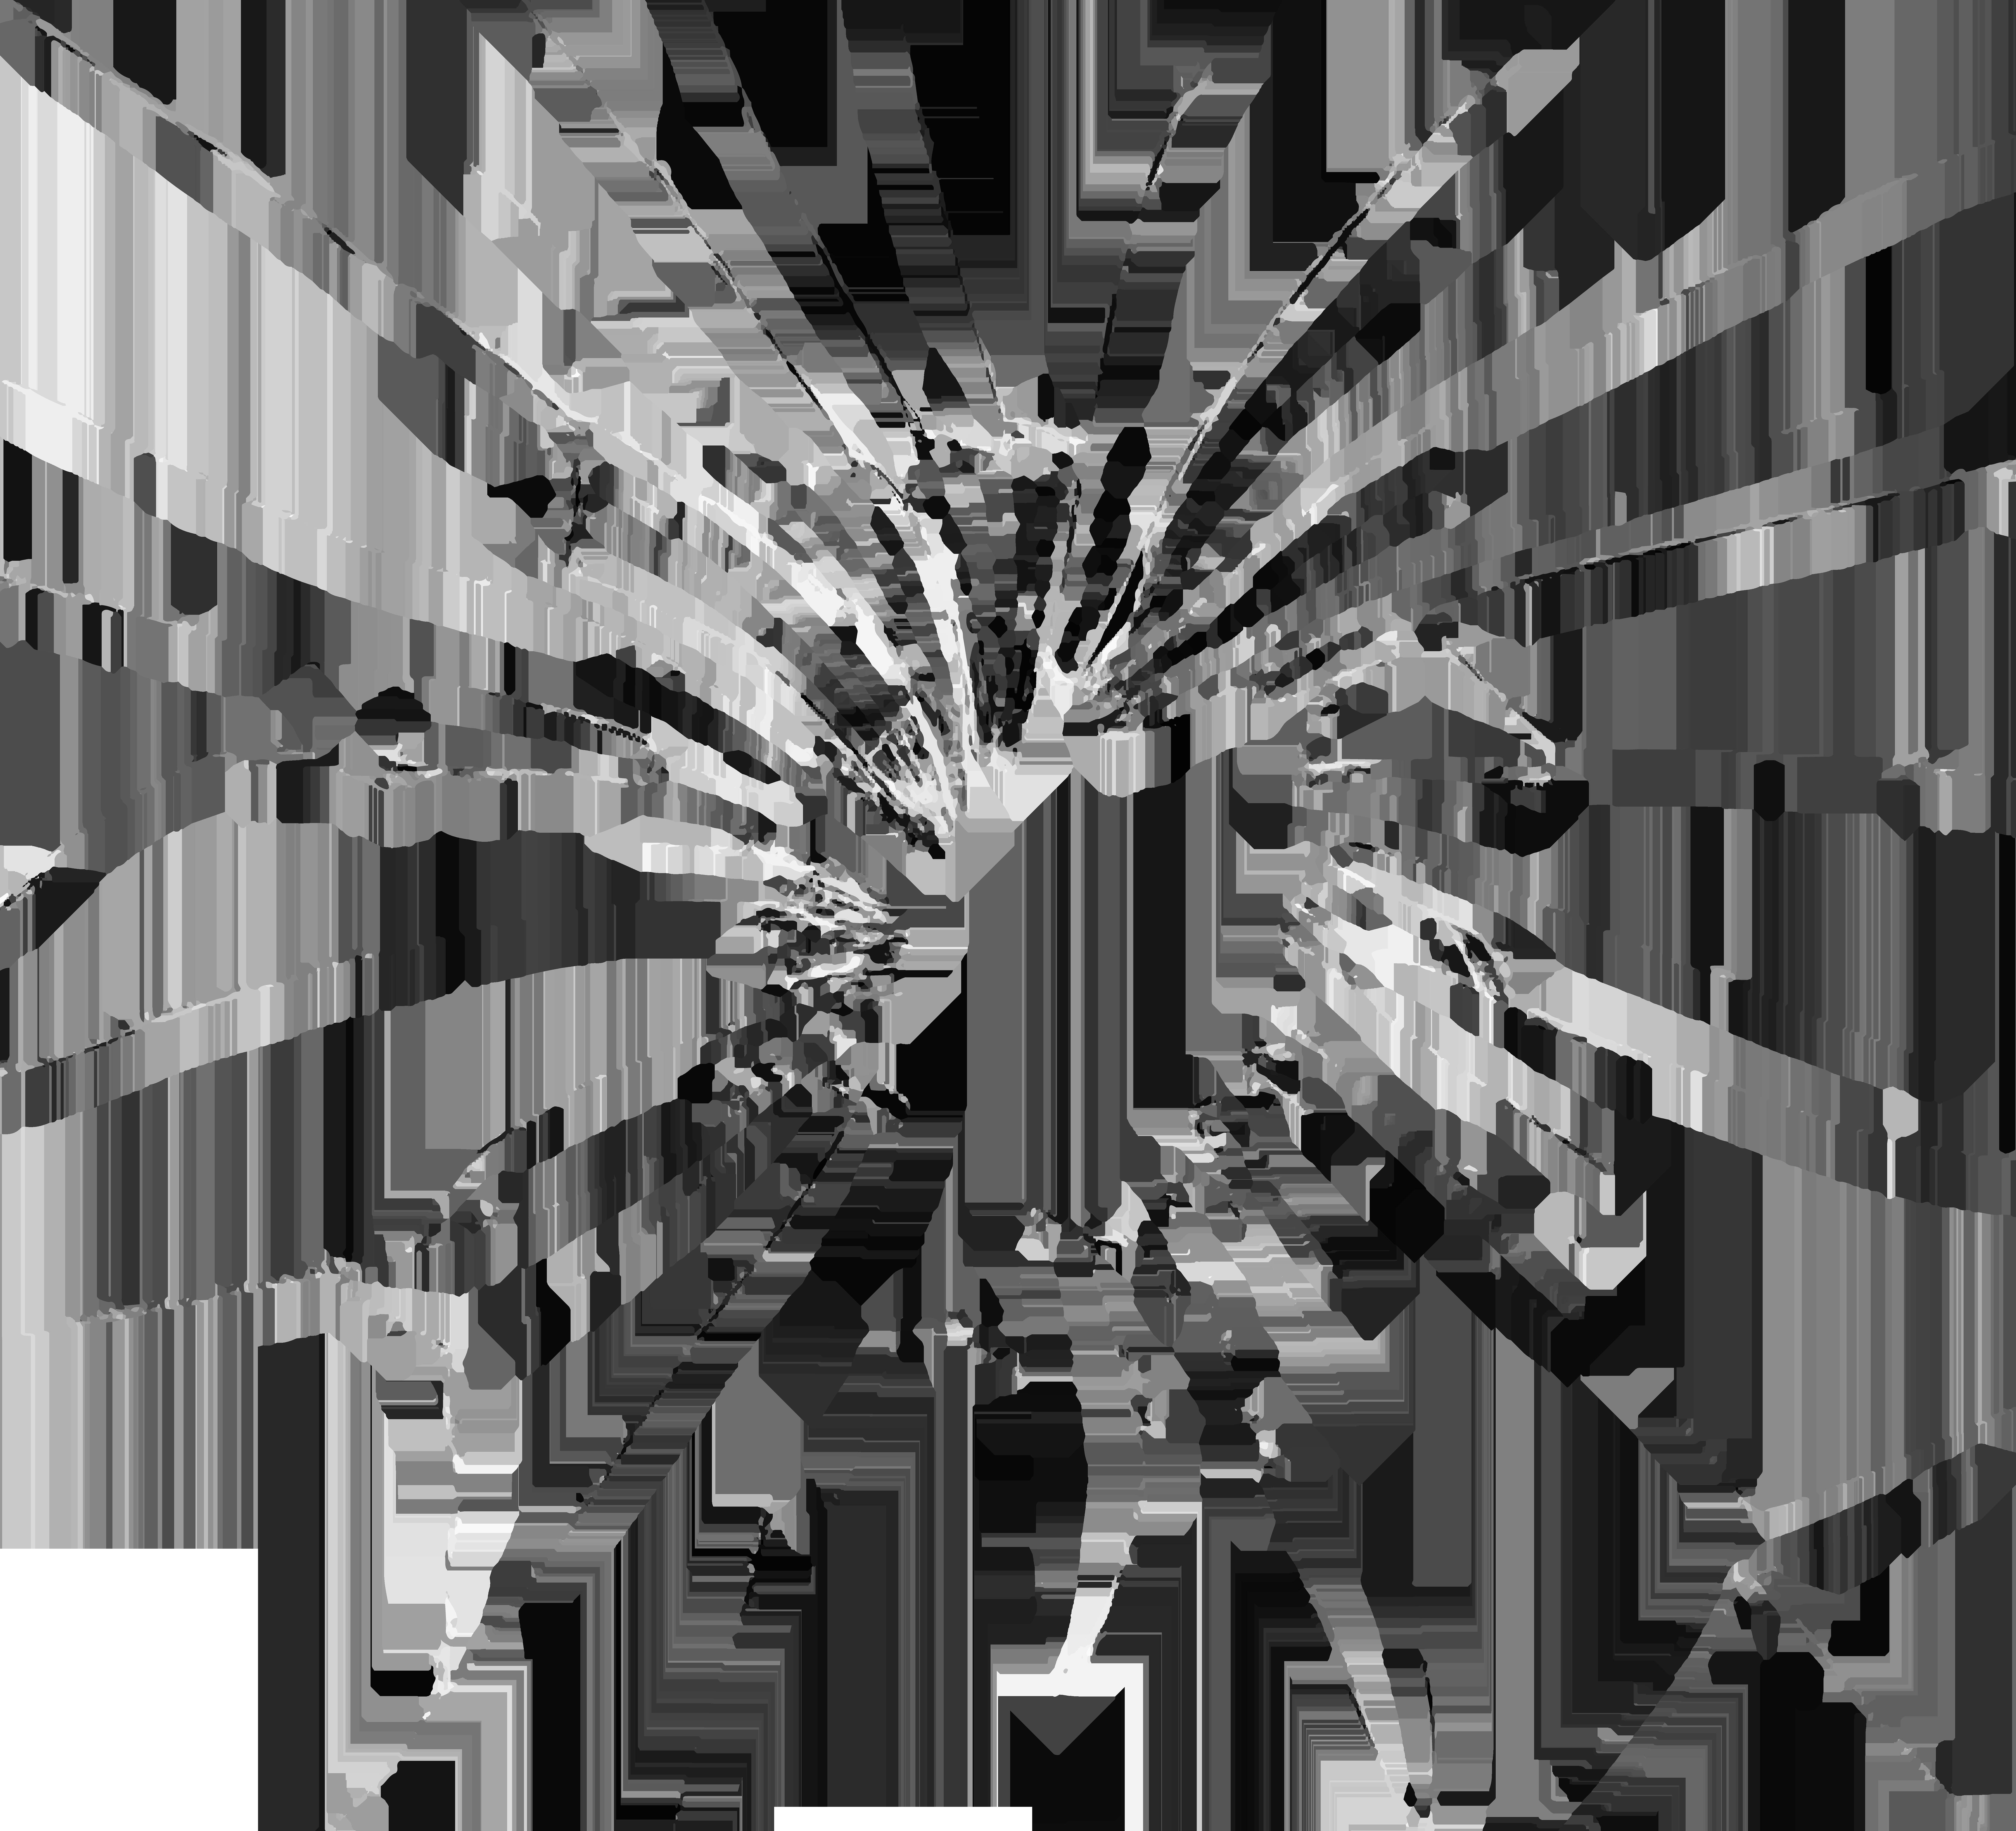 jpg freeuse download Broken glass effect png. Shattered drawing